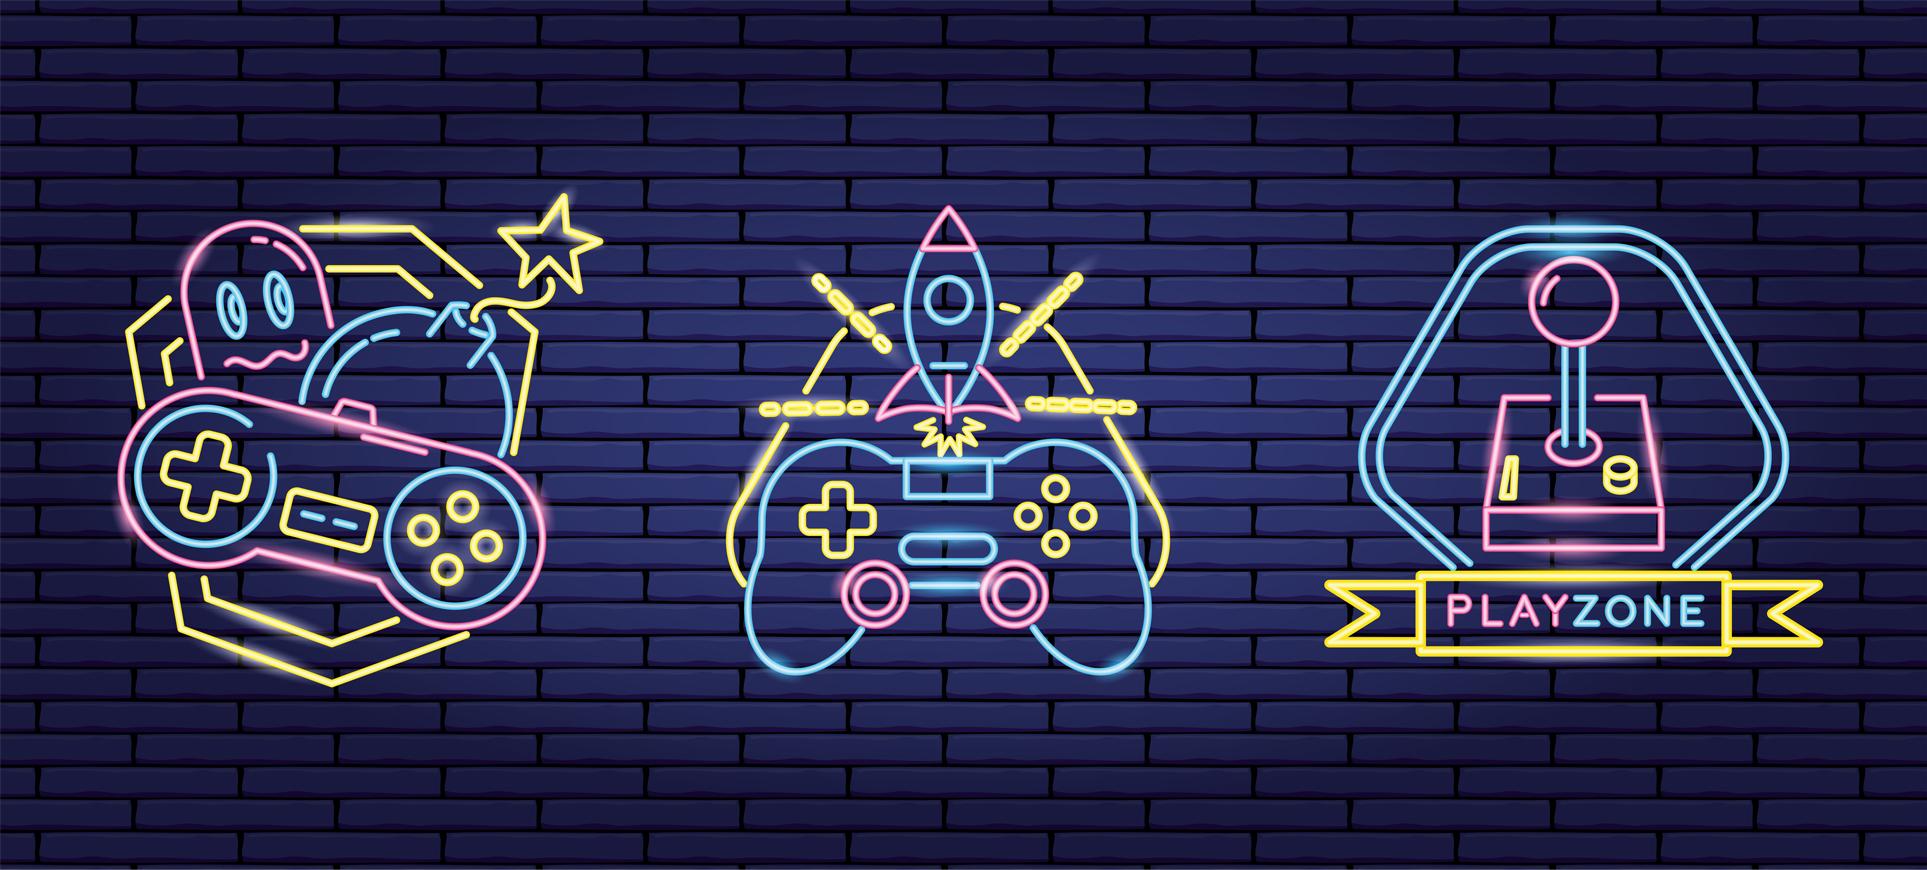 extra games 1hitgames categoria jogos noticias news gaming 1Hit videogame neon